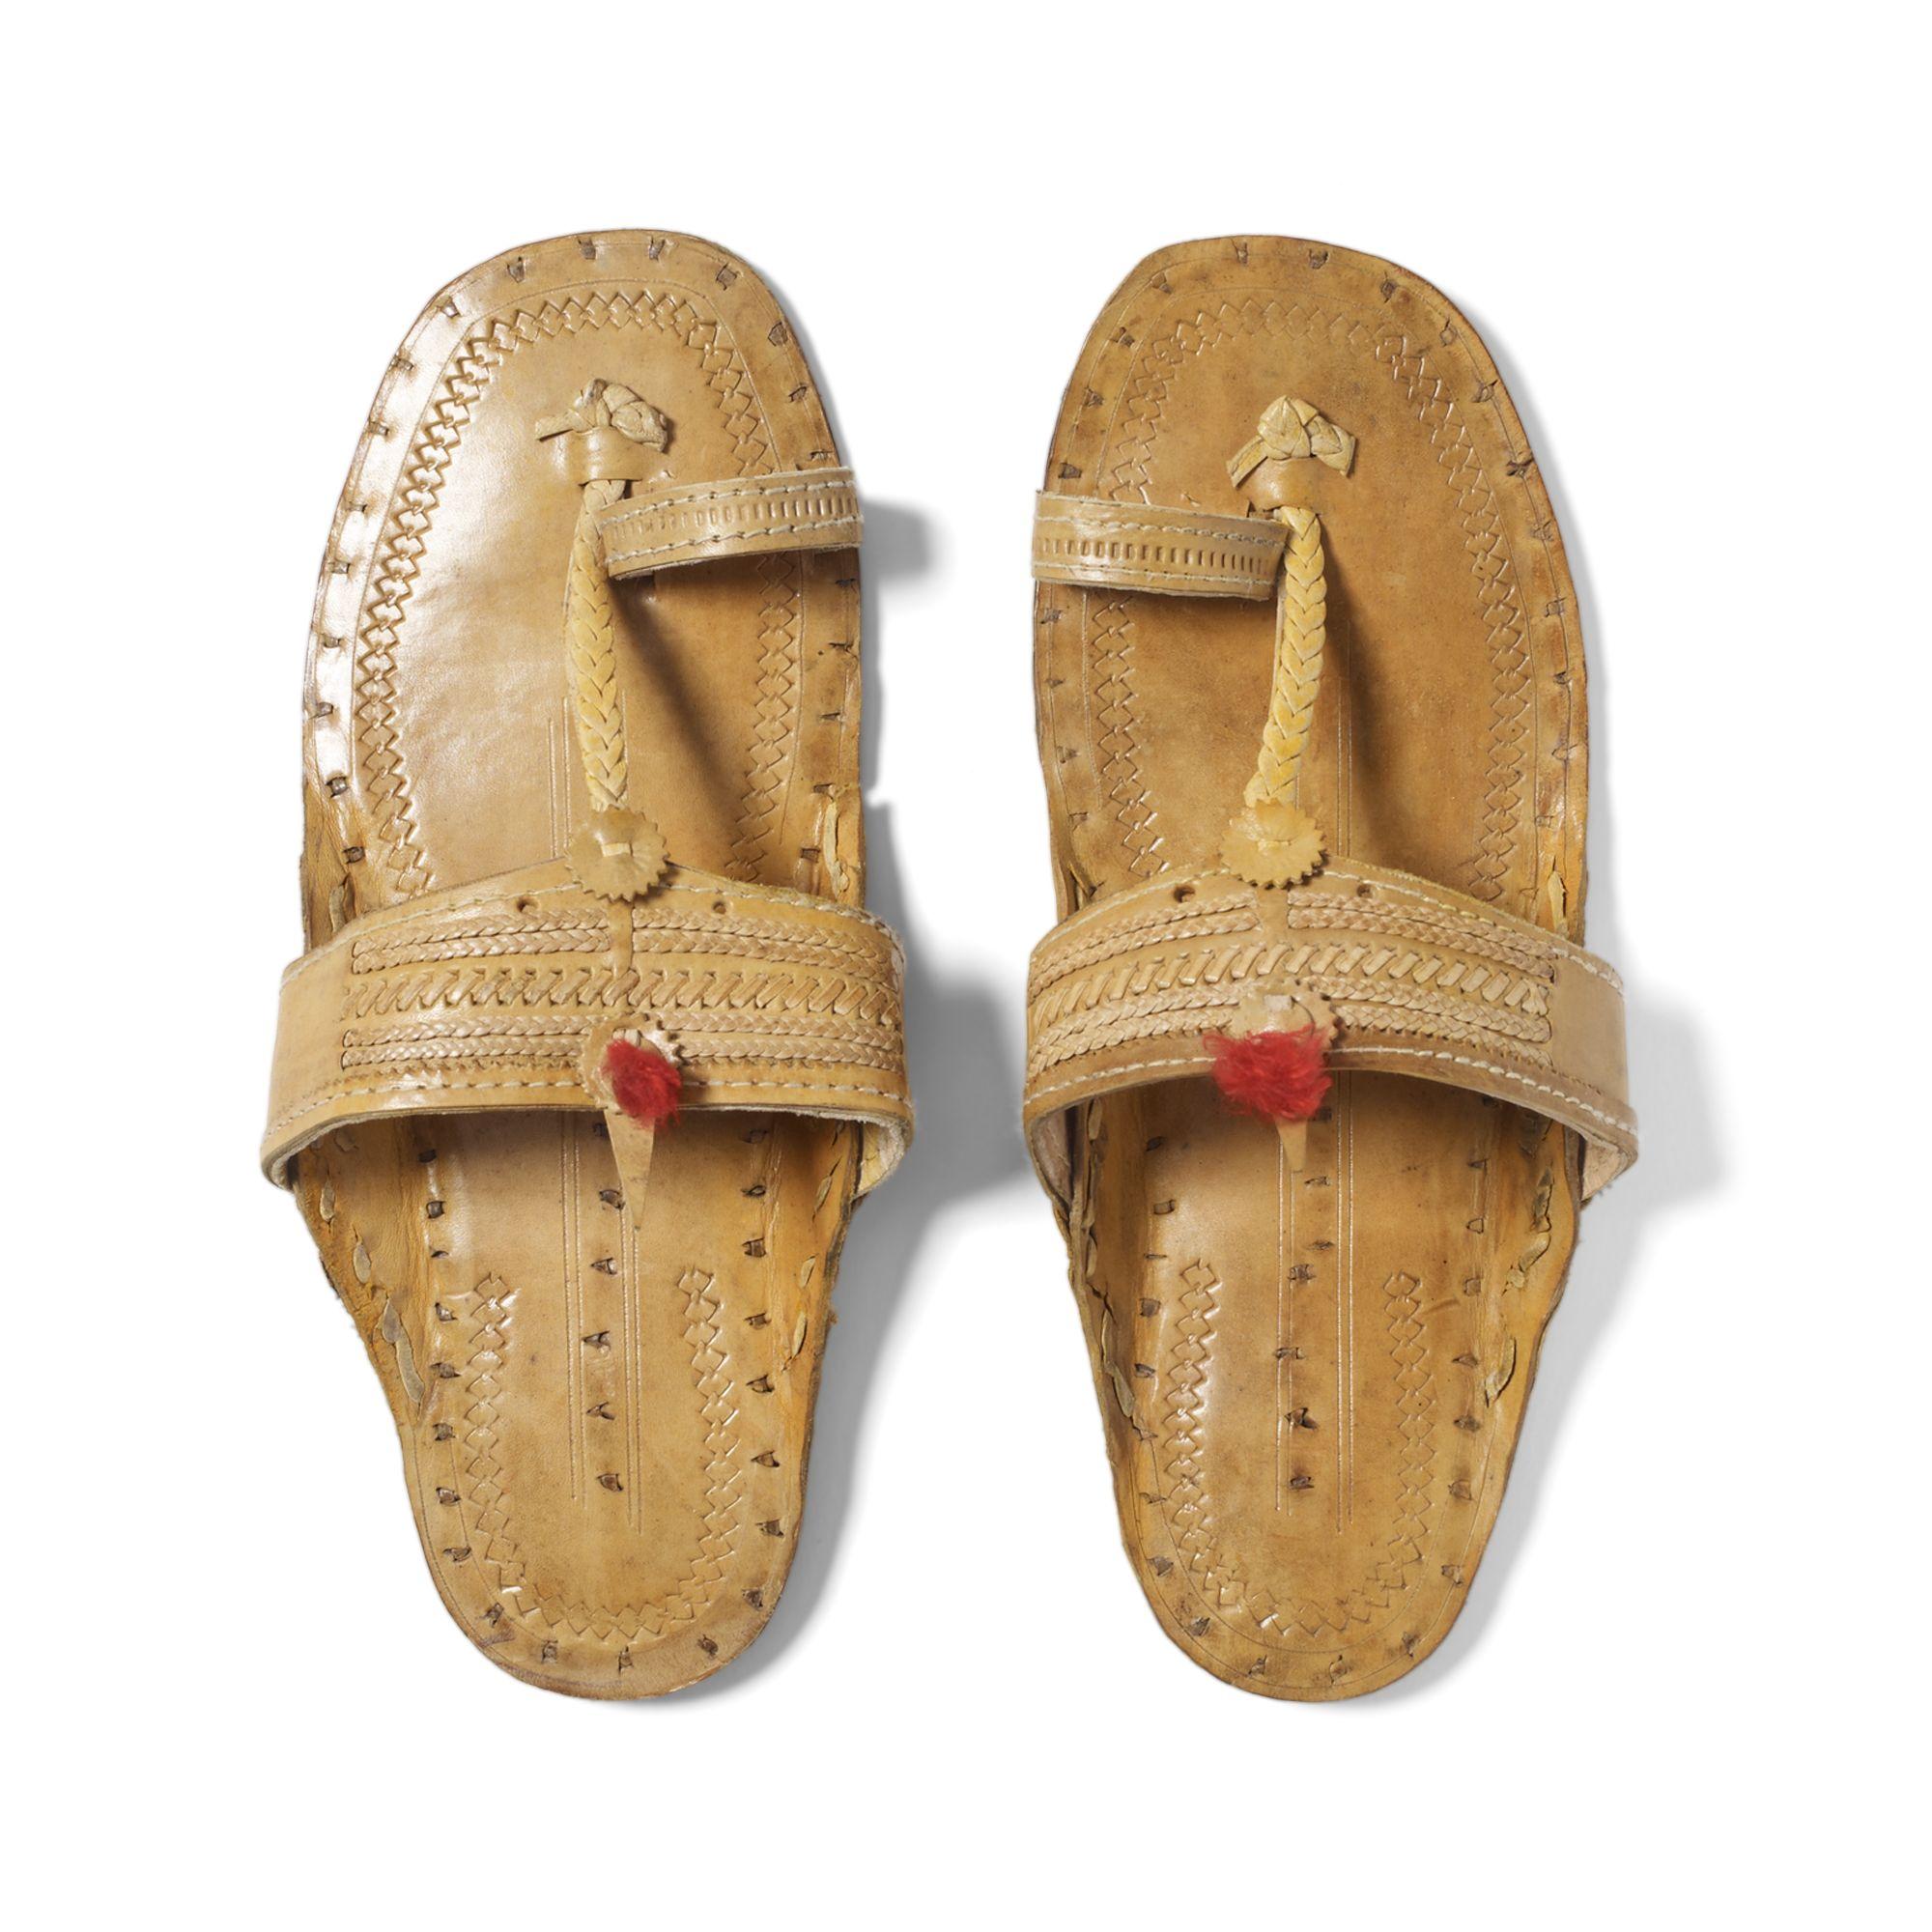 b341791d33c179 Lyst - Club Monaco Indian Sandals in Natural